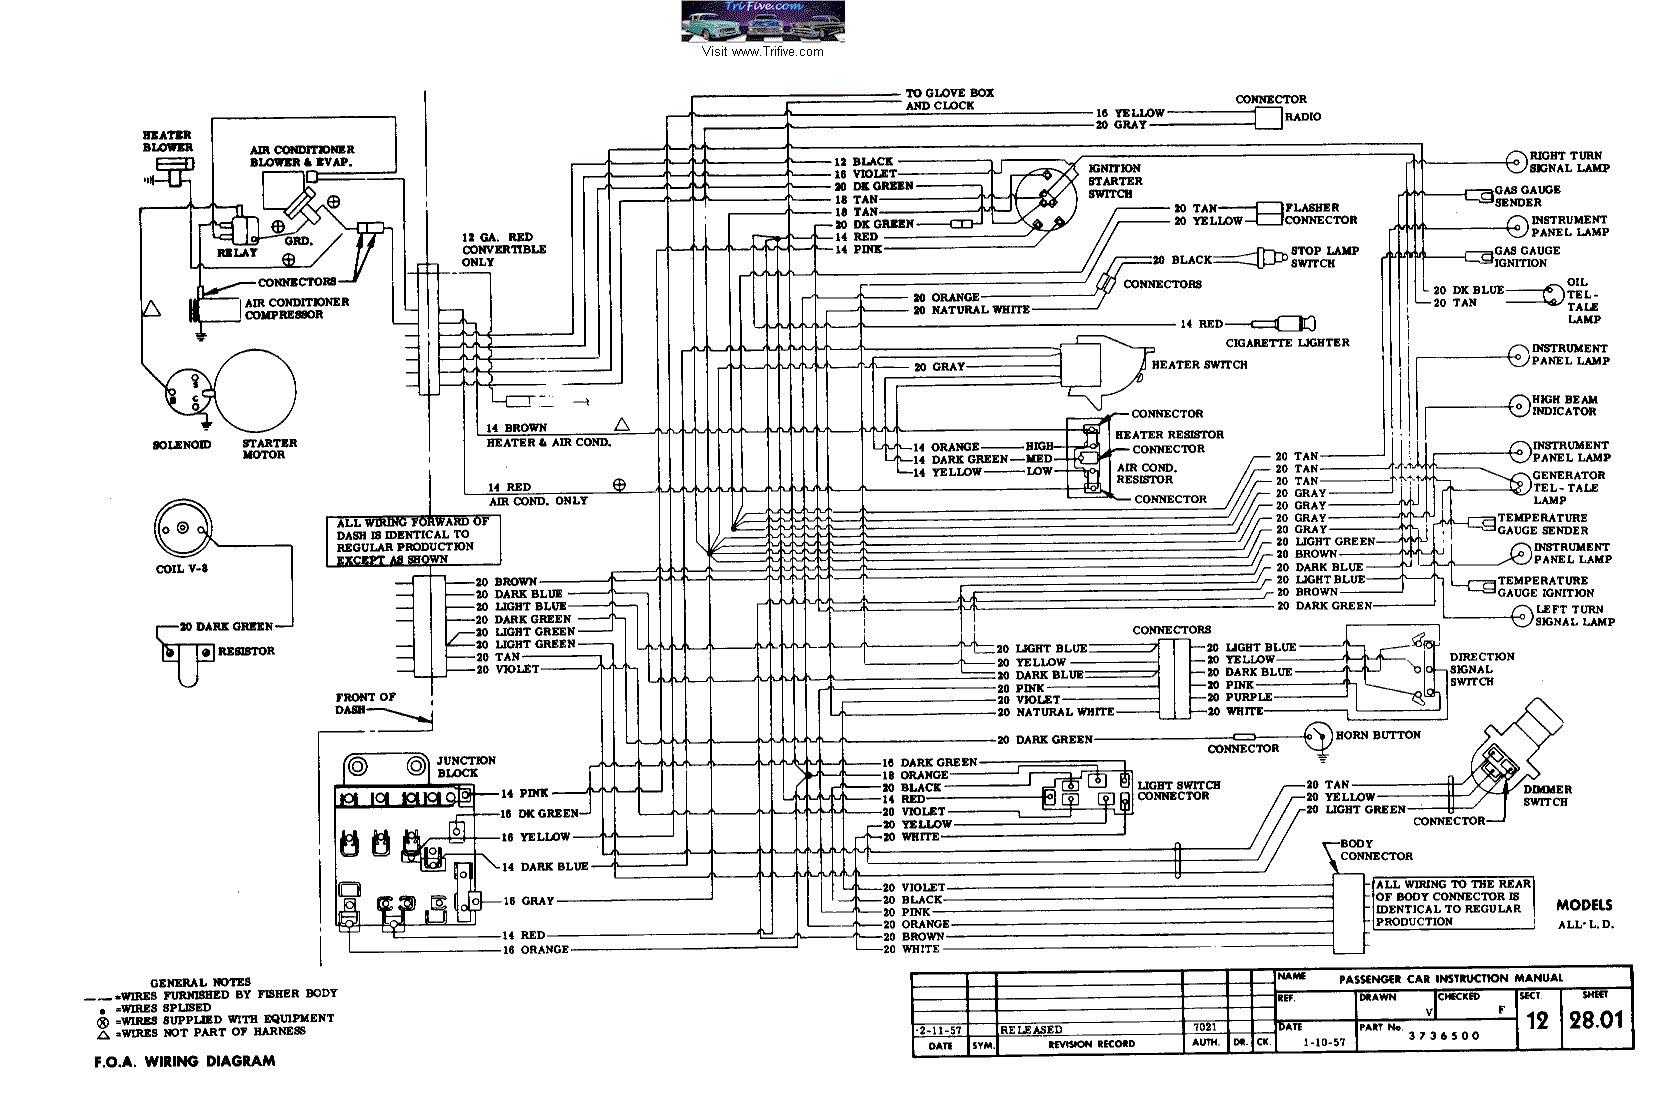 57 chevy wiper motor wiring diagram wiring diagram GMC Wiper Motor Wiring Diagram 1955 chevy turn signal switch wiring diagram electrical schematic 57 chevy wiper motor